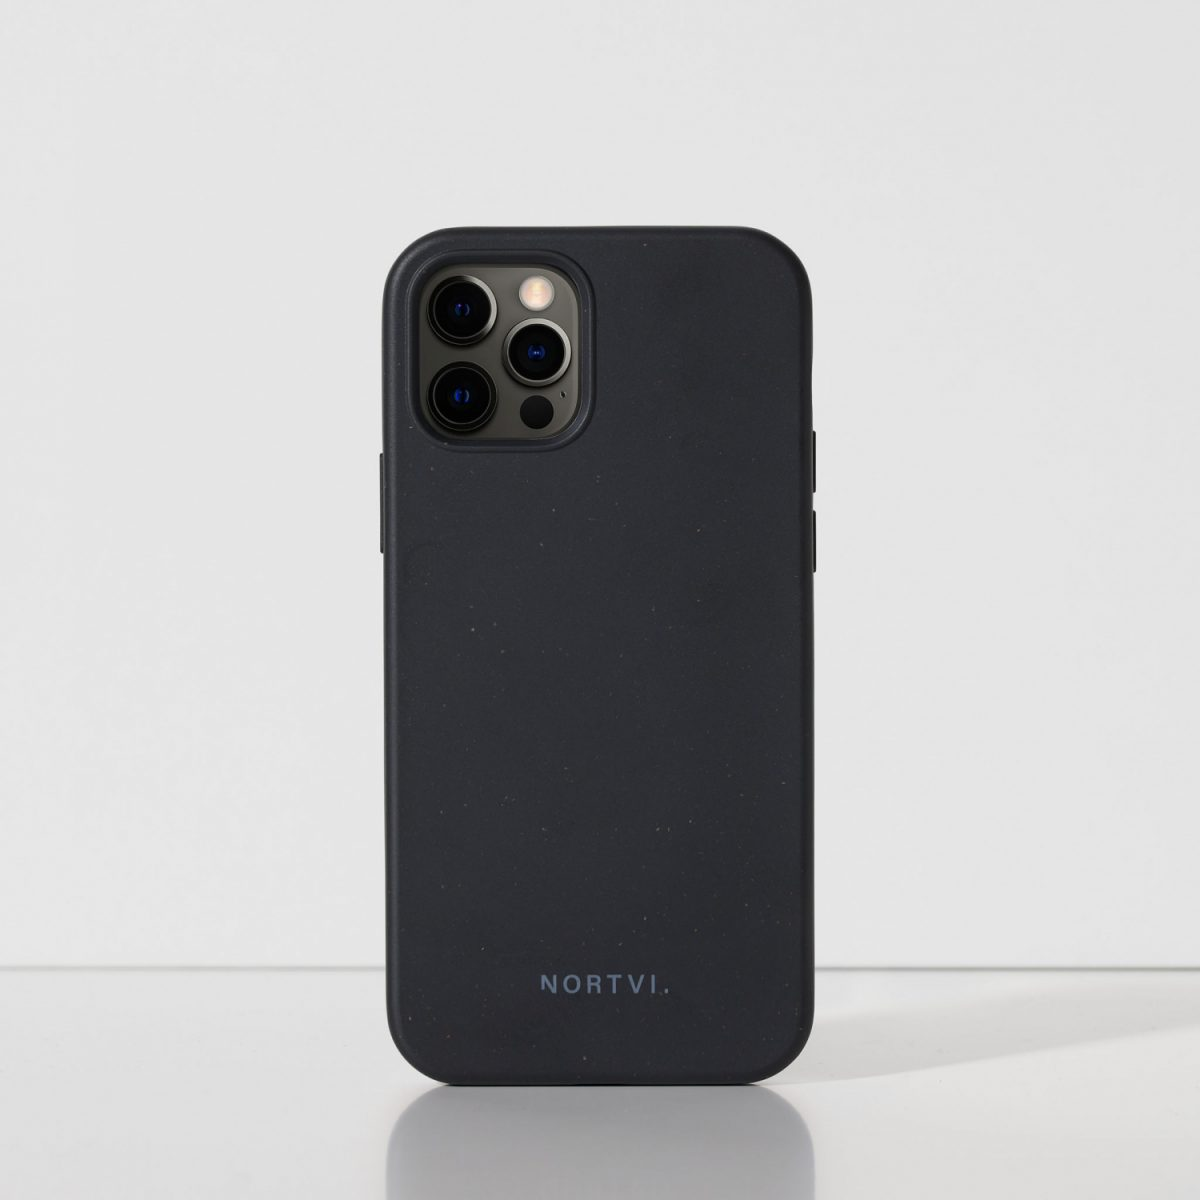 NORTVI black phone case for iPhone 12 Pro case